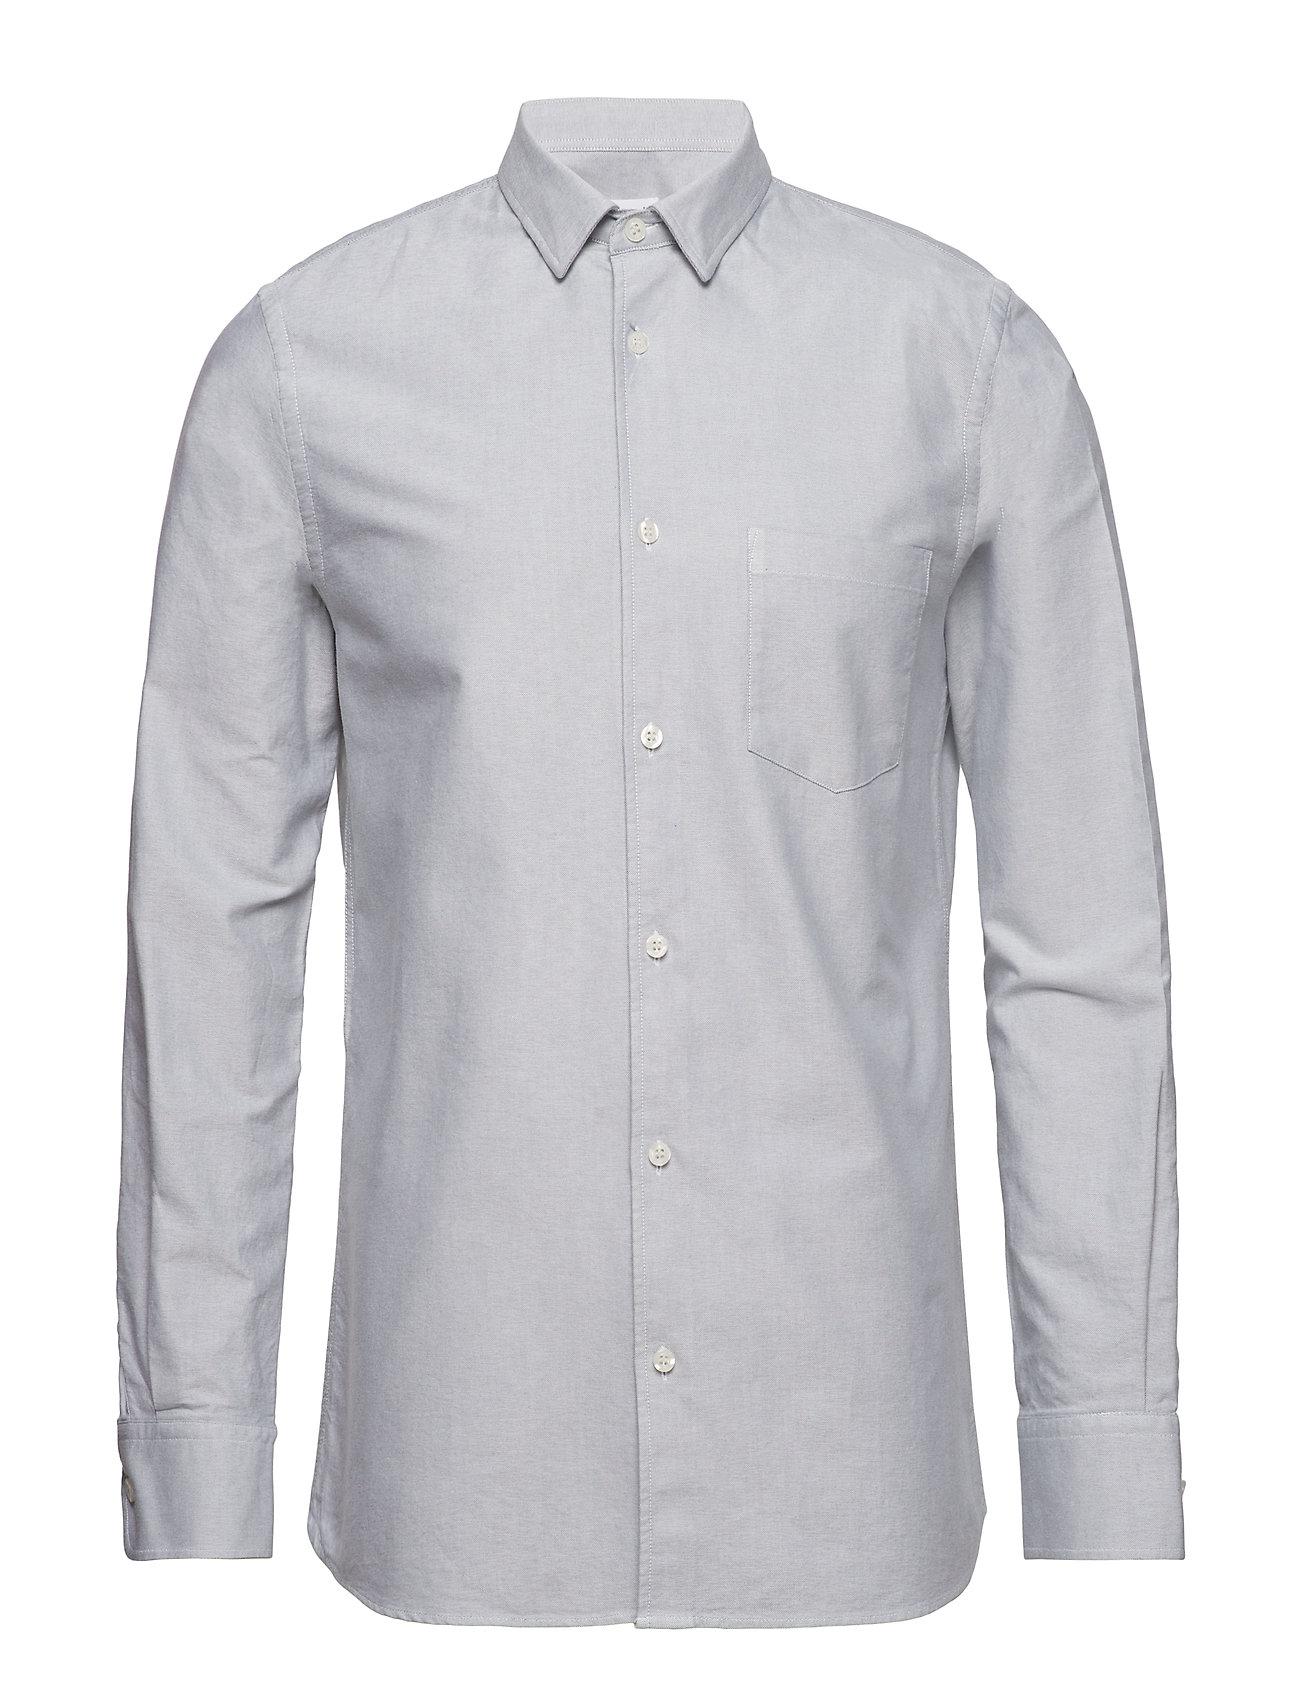 Filippa K M. Tim Oxford Shirt - PLATOON/WH